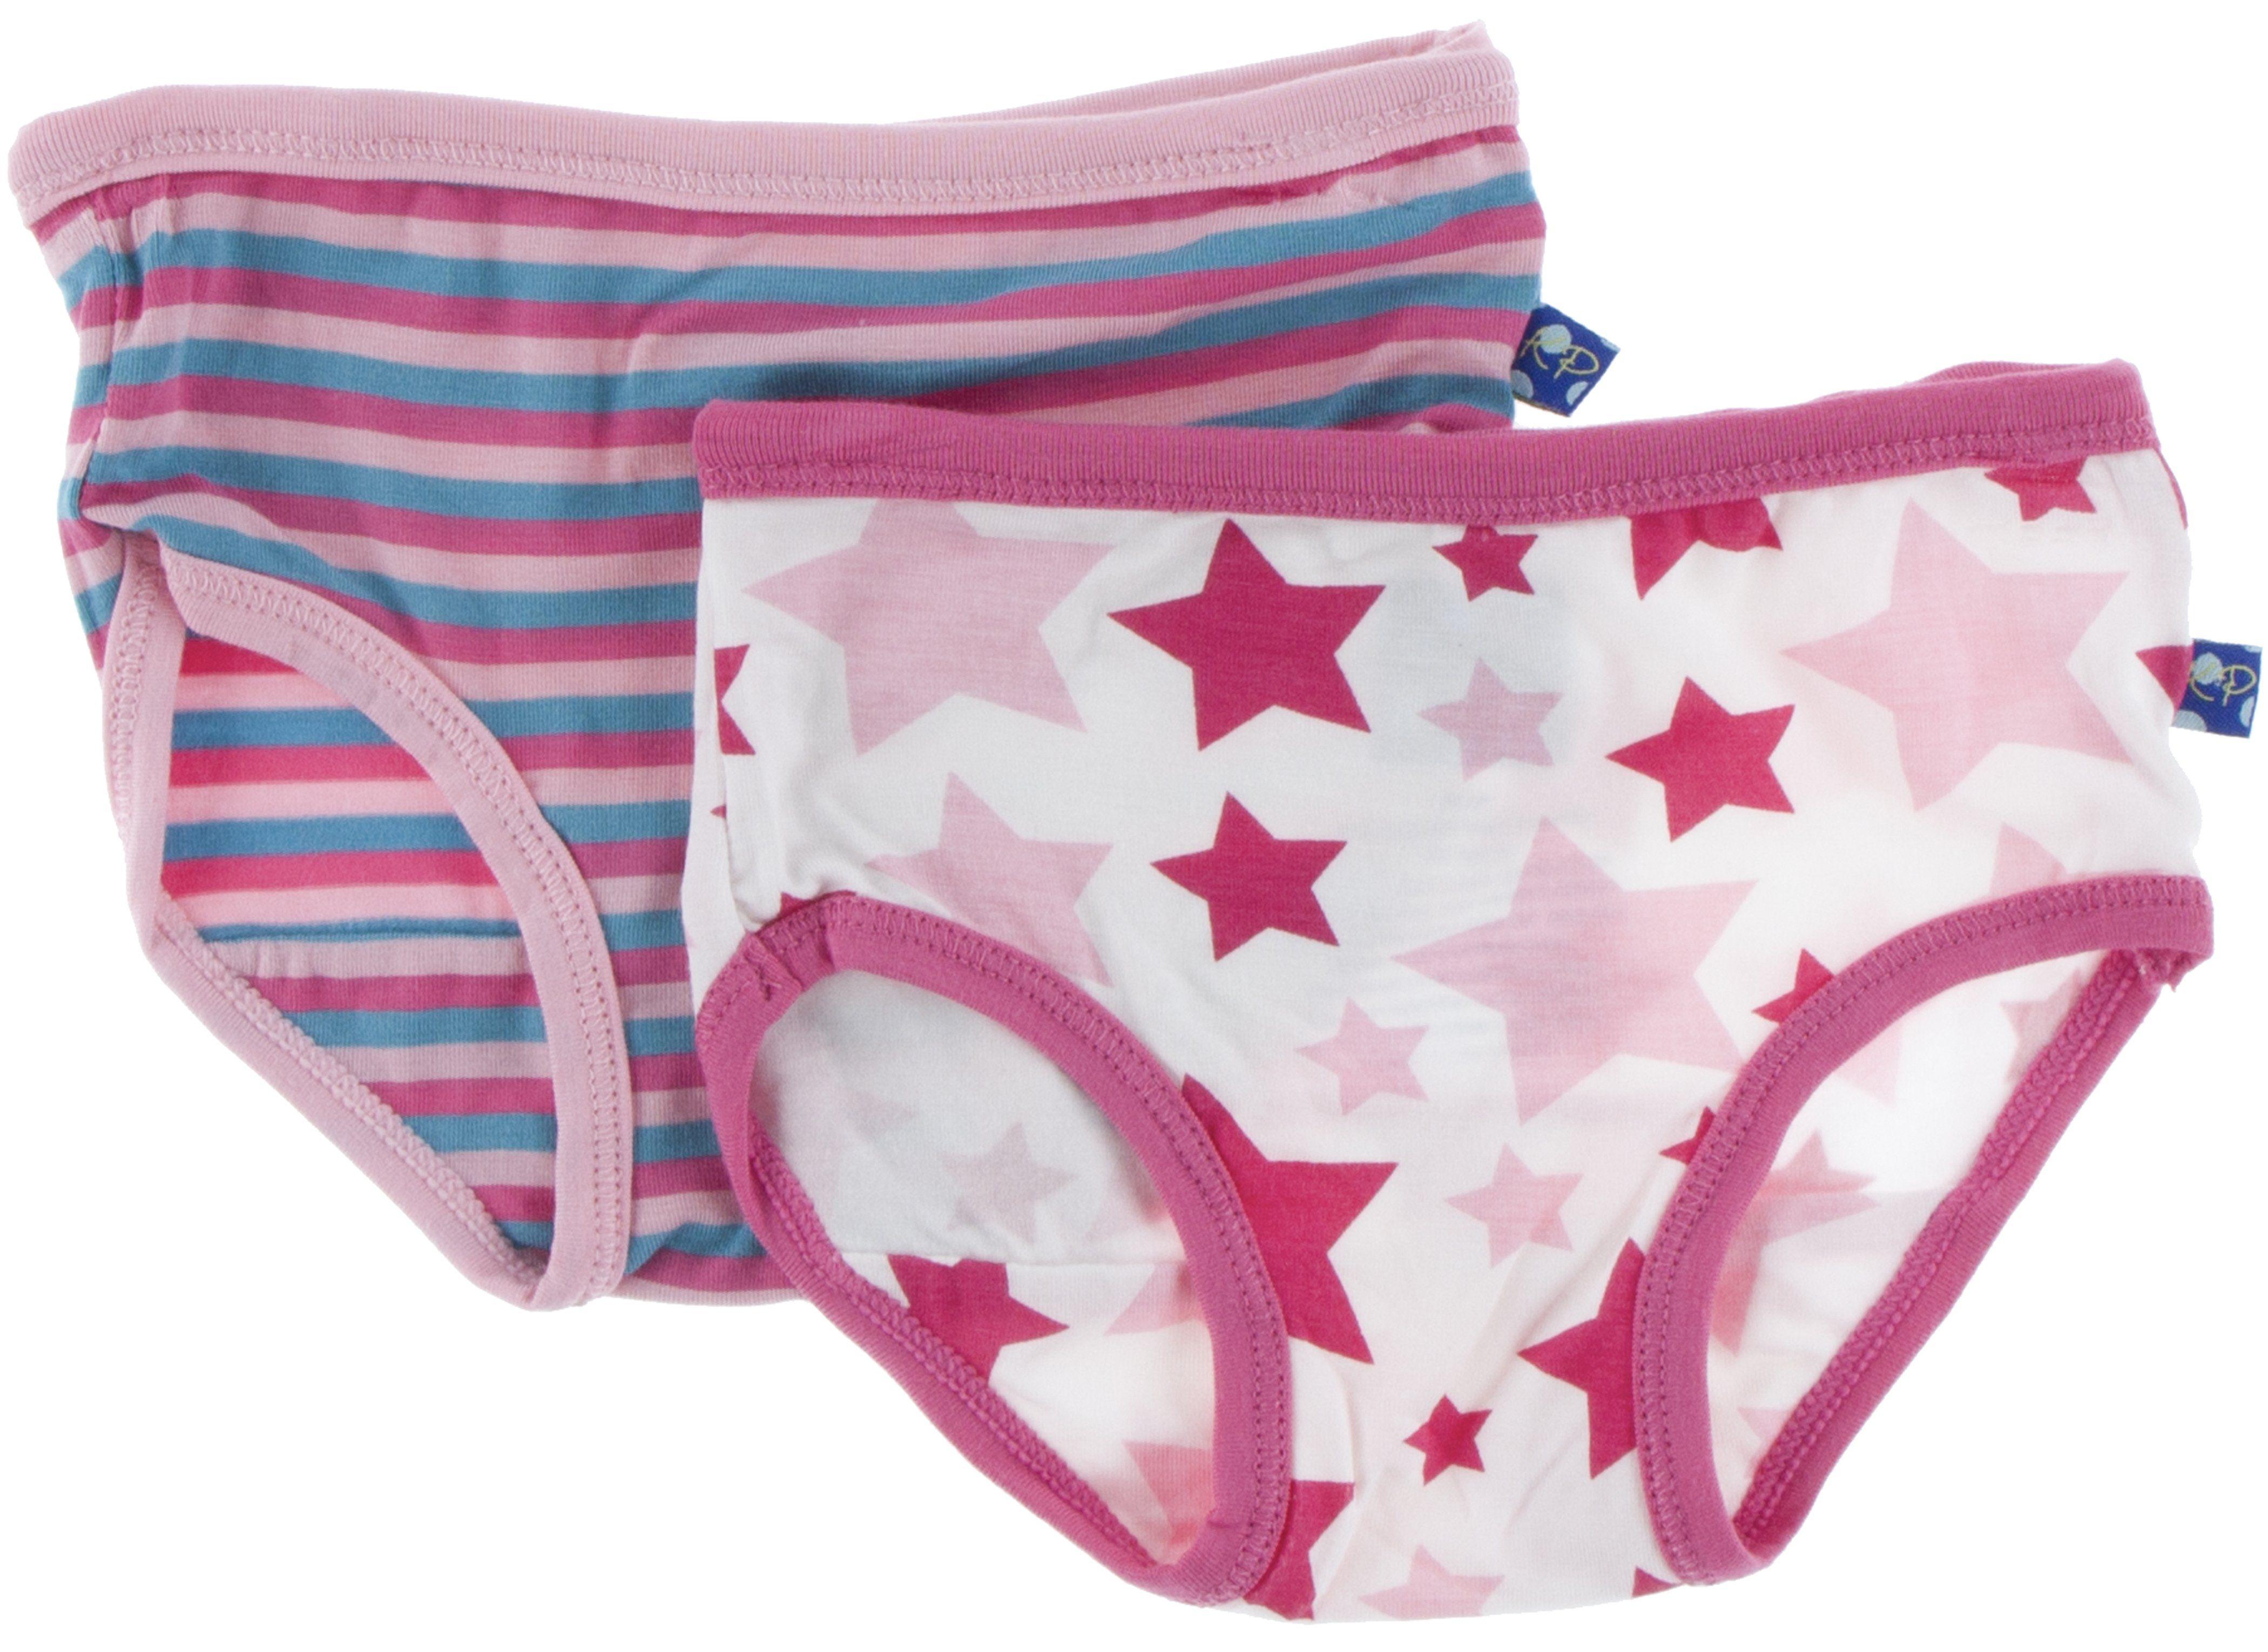 58ead72d7120 KicKee Pants Flamingo Anniversary Stripe & Flamingo Star Underwear  Set-PRESALE